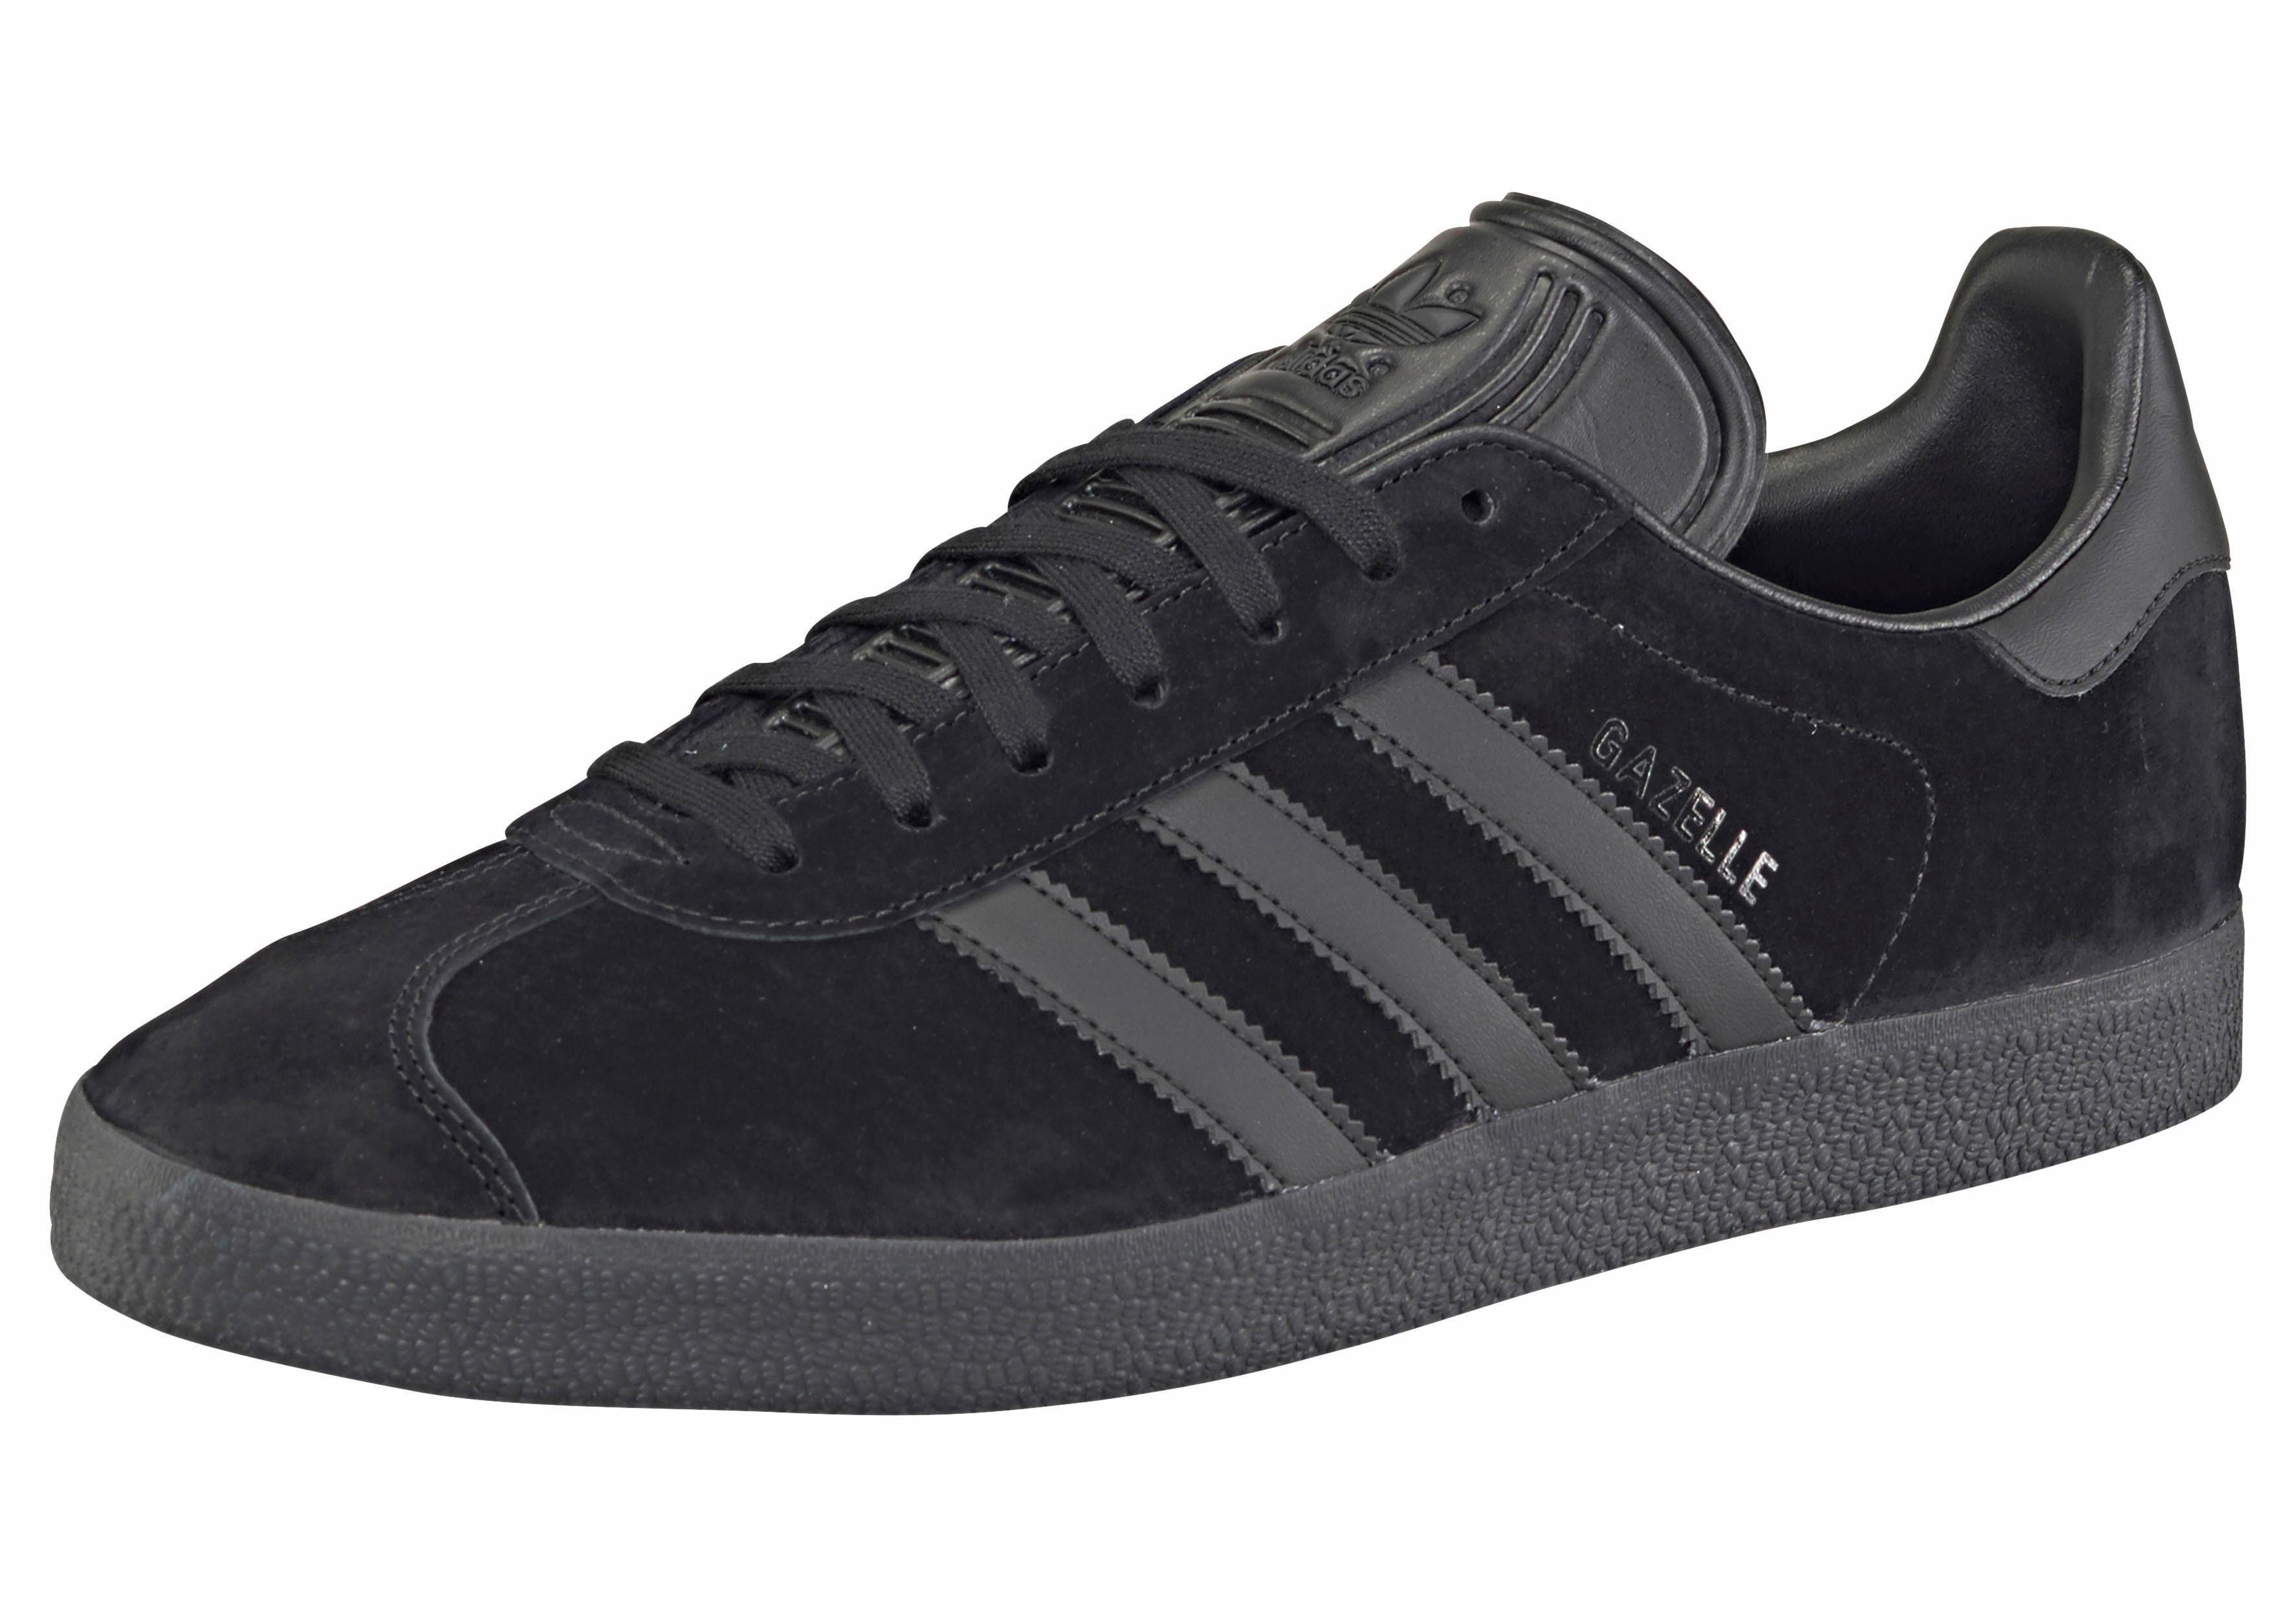 adidas Gazelle sneakers koop je online al vanaf € 69,74 | OTTO